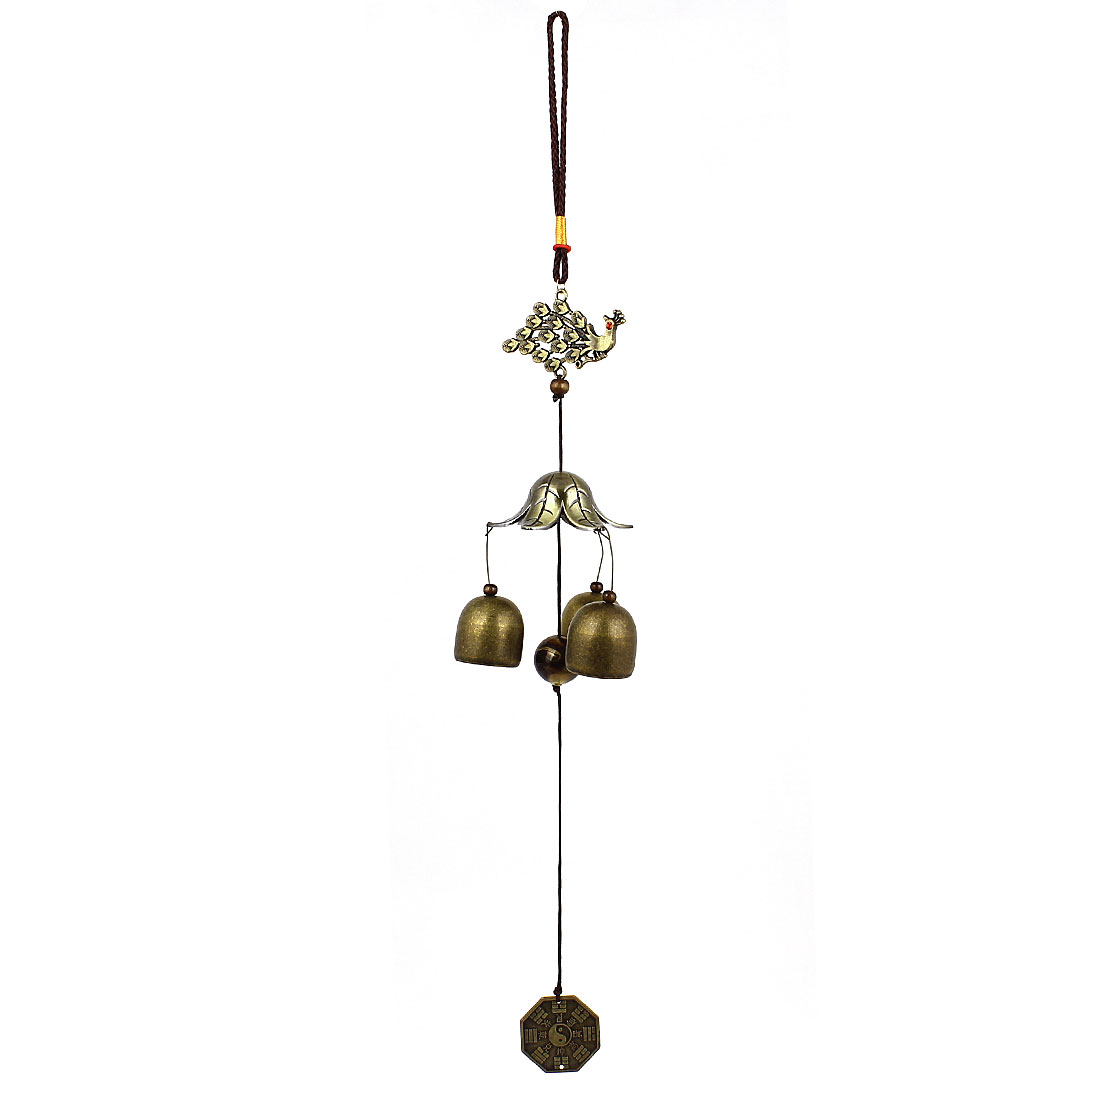 Peafowl Copper Cash Three Jingle Bells Dangling Detail Decor Bronze Tone Windbell